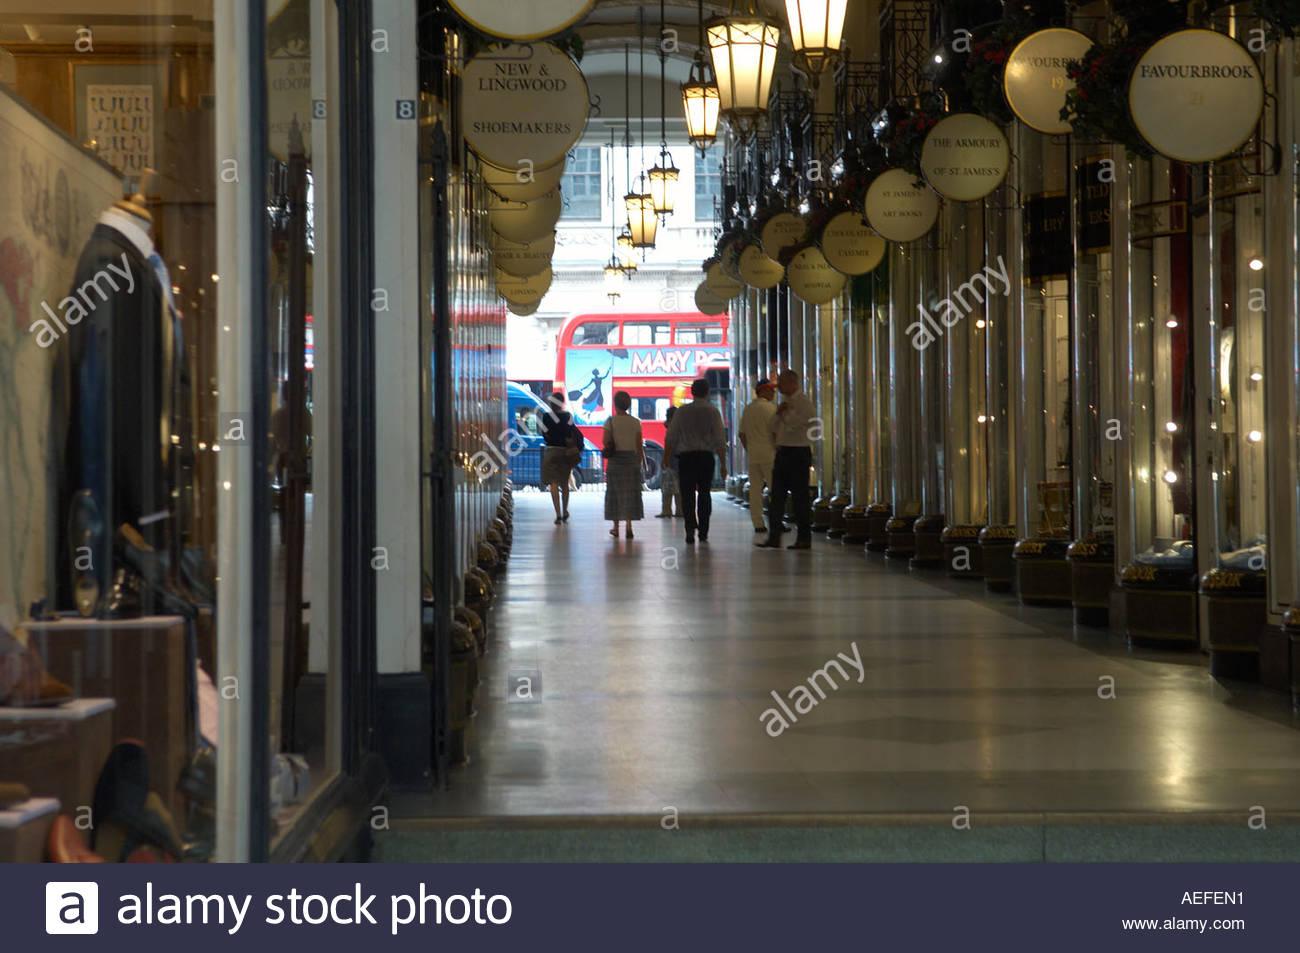 Shopping Arcade in Jermyn Street in London CREDIT Geraint Lewis - Stock Image